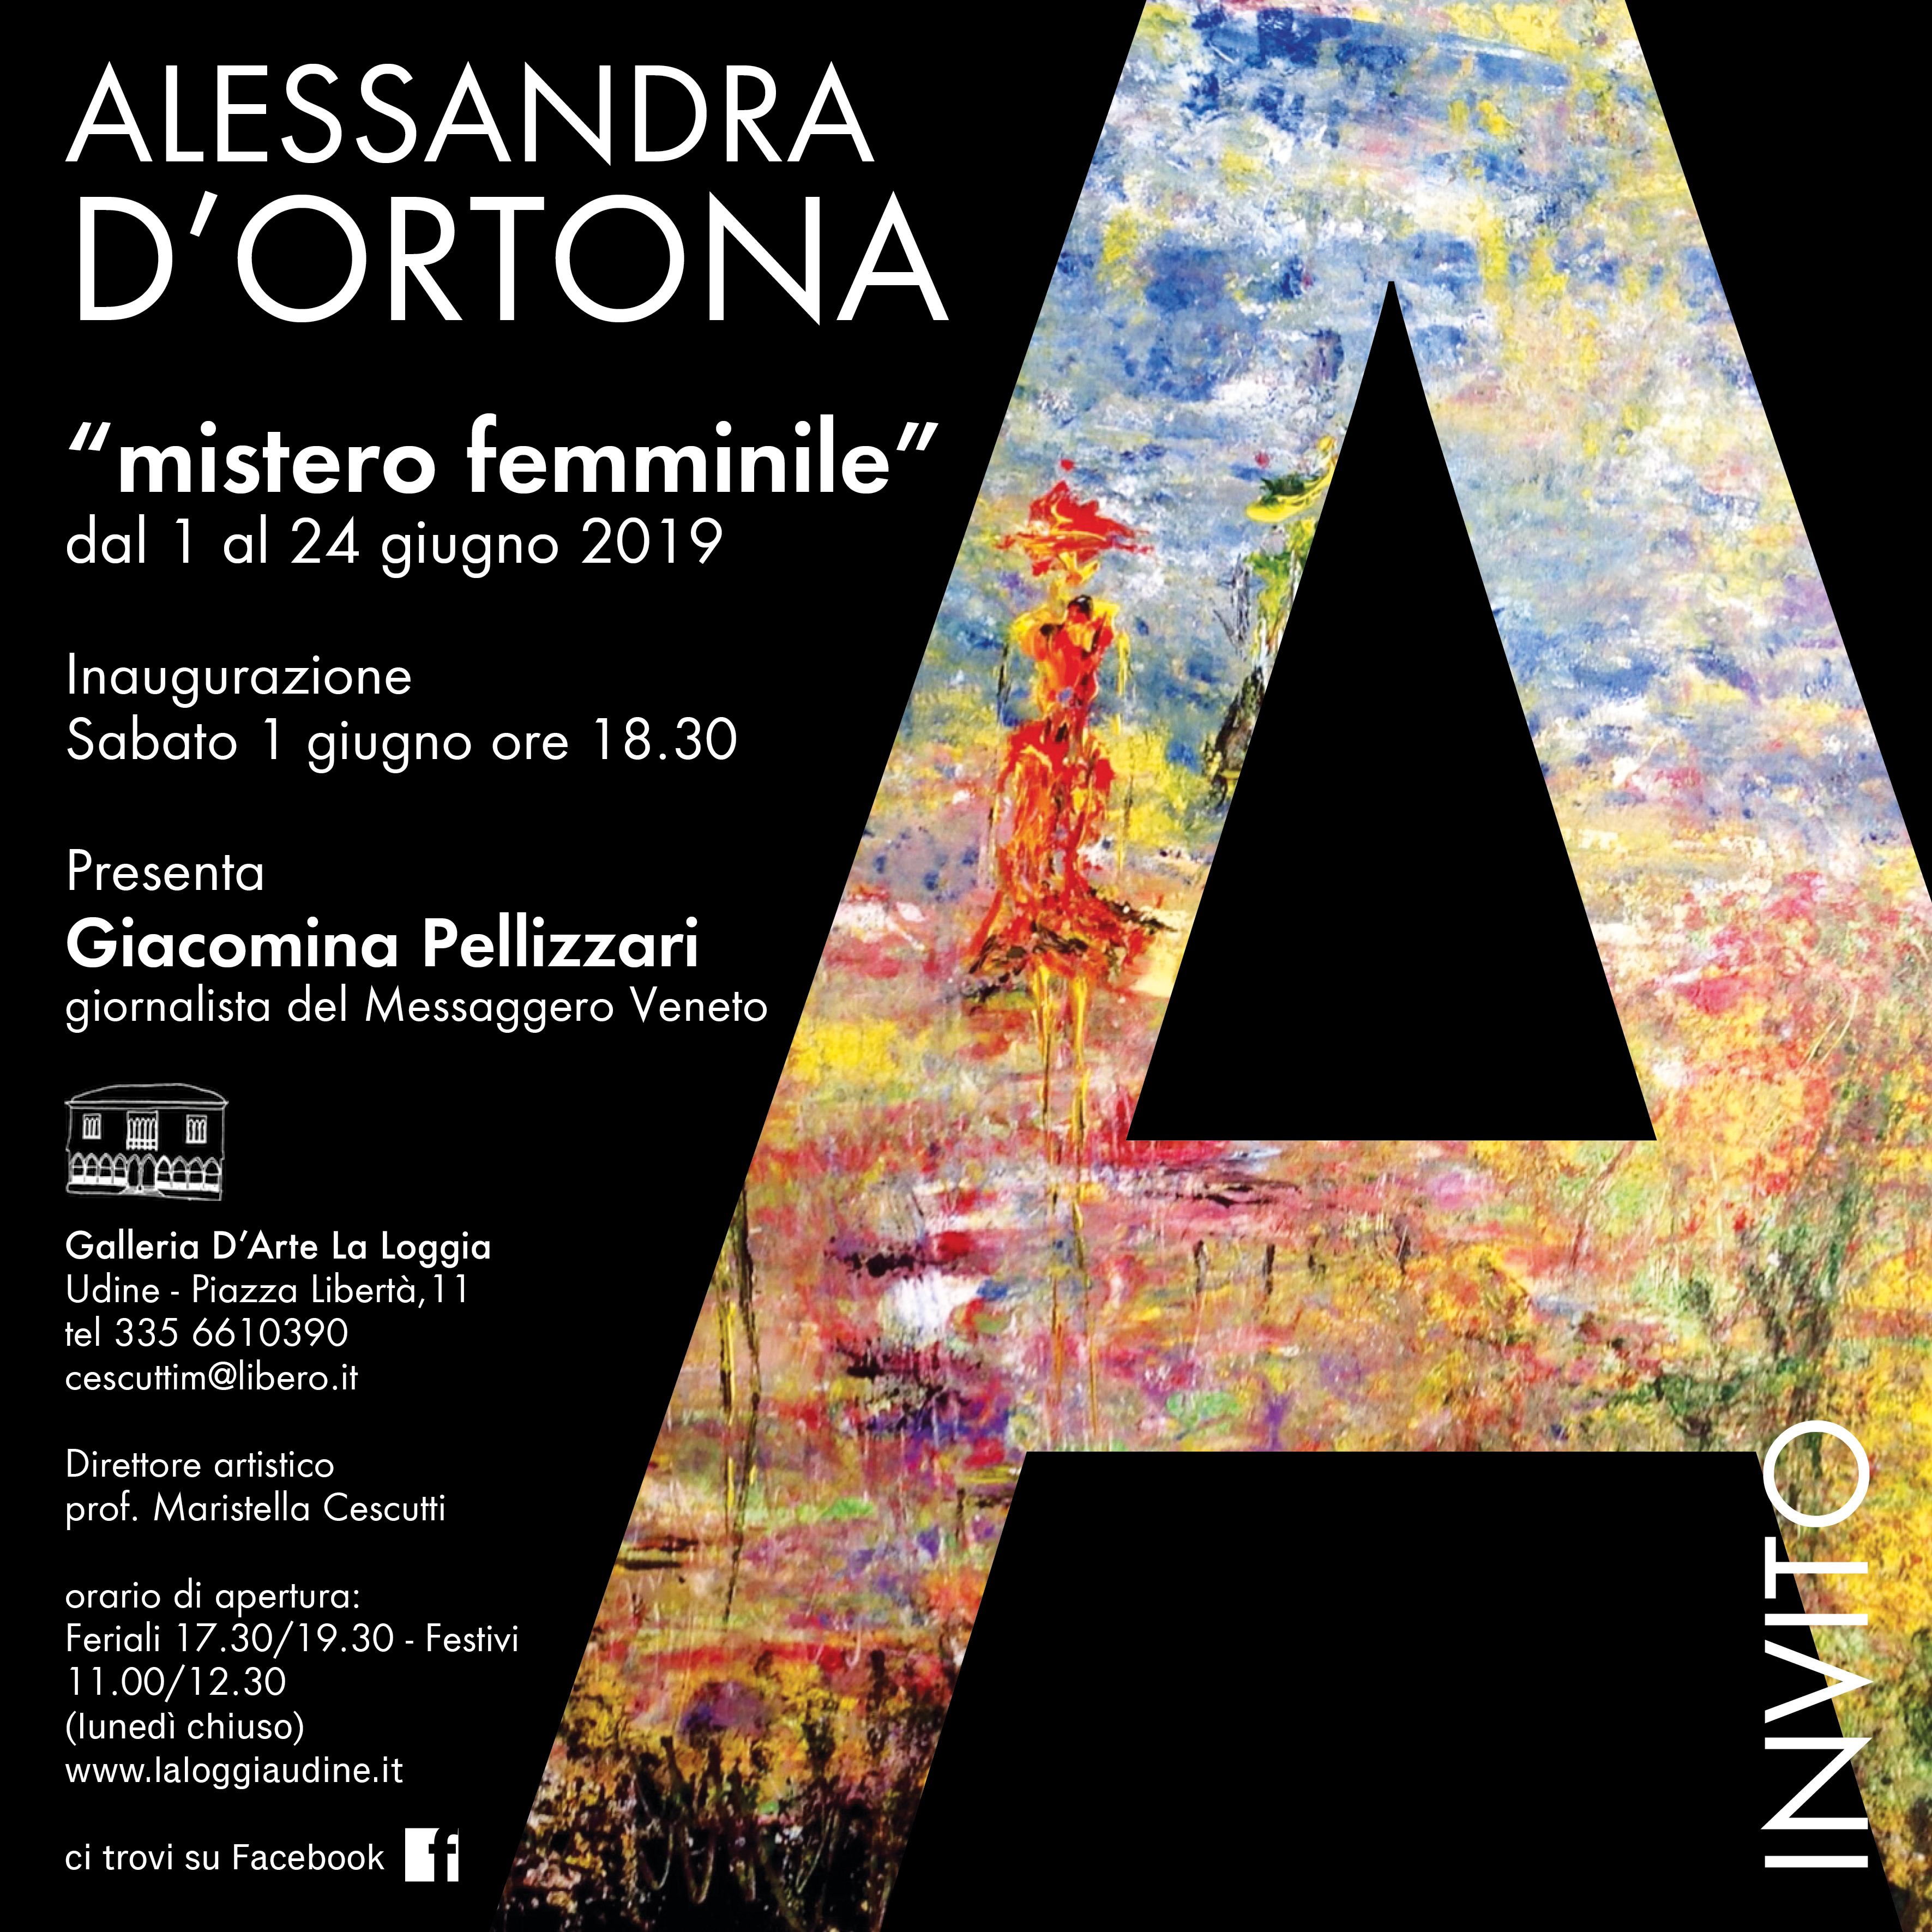 INVITO_ALESSANDRA DORTONA_3